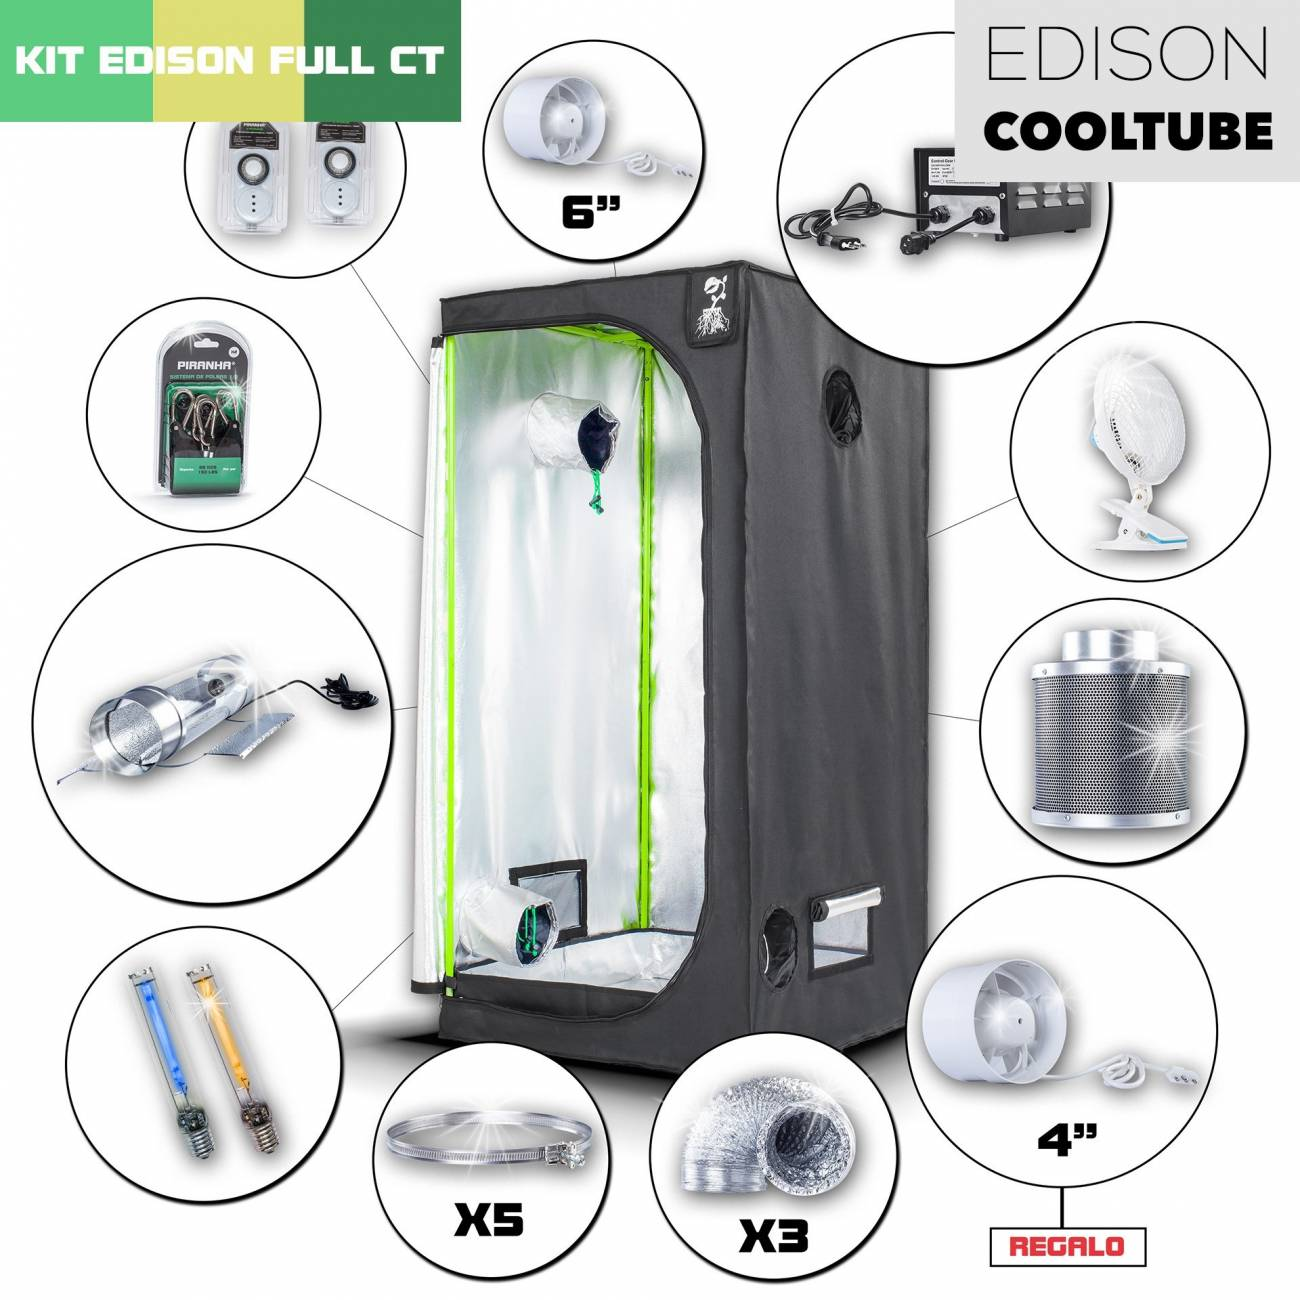 Kit Edison CoolTube 80 Completo 250W